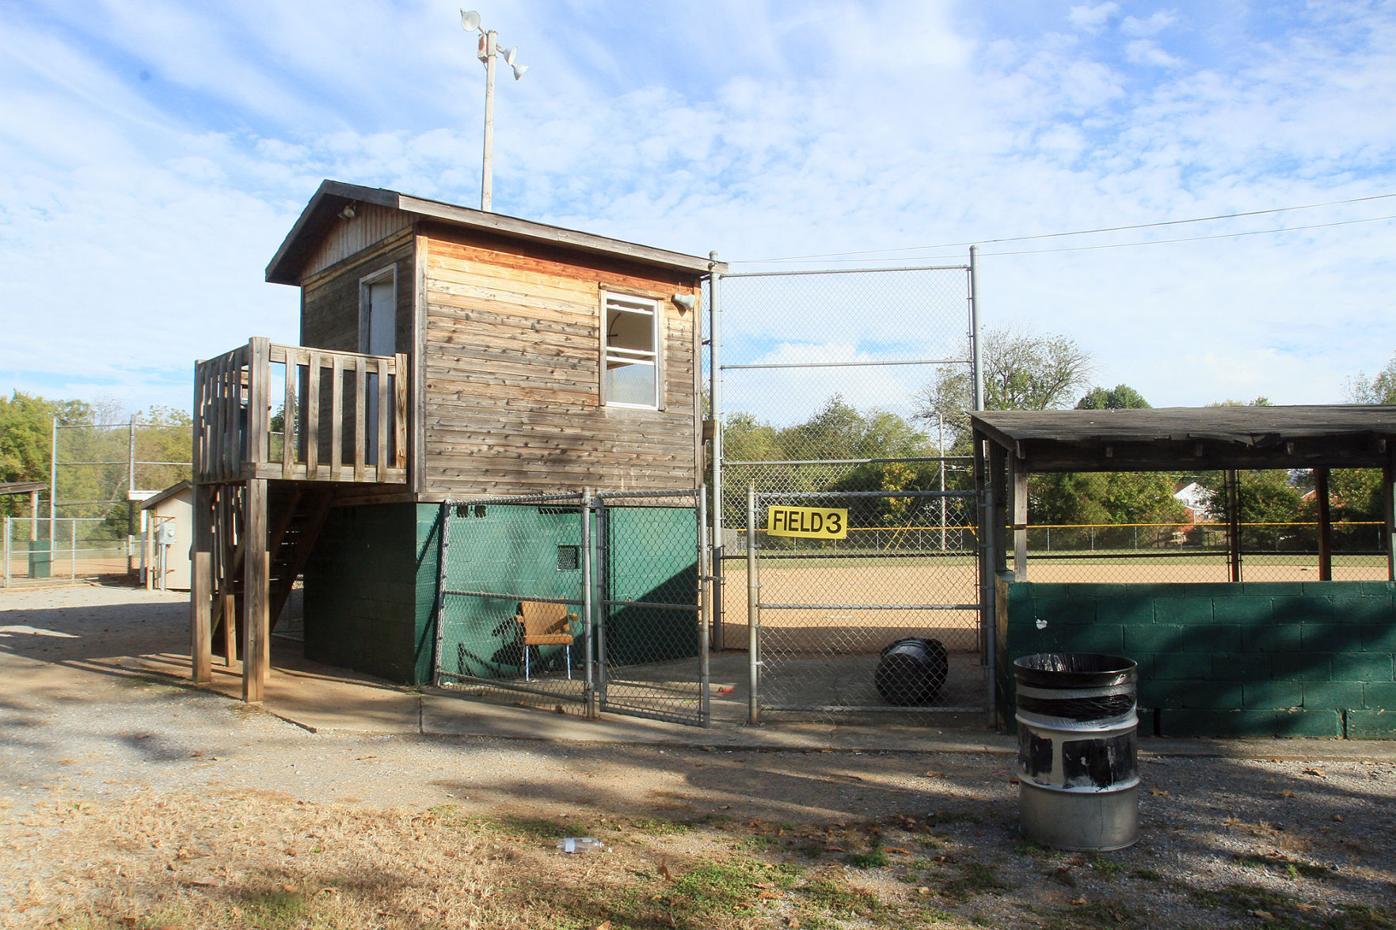 Eagleton Baseball Field: Score Box (2021)